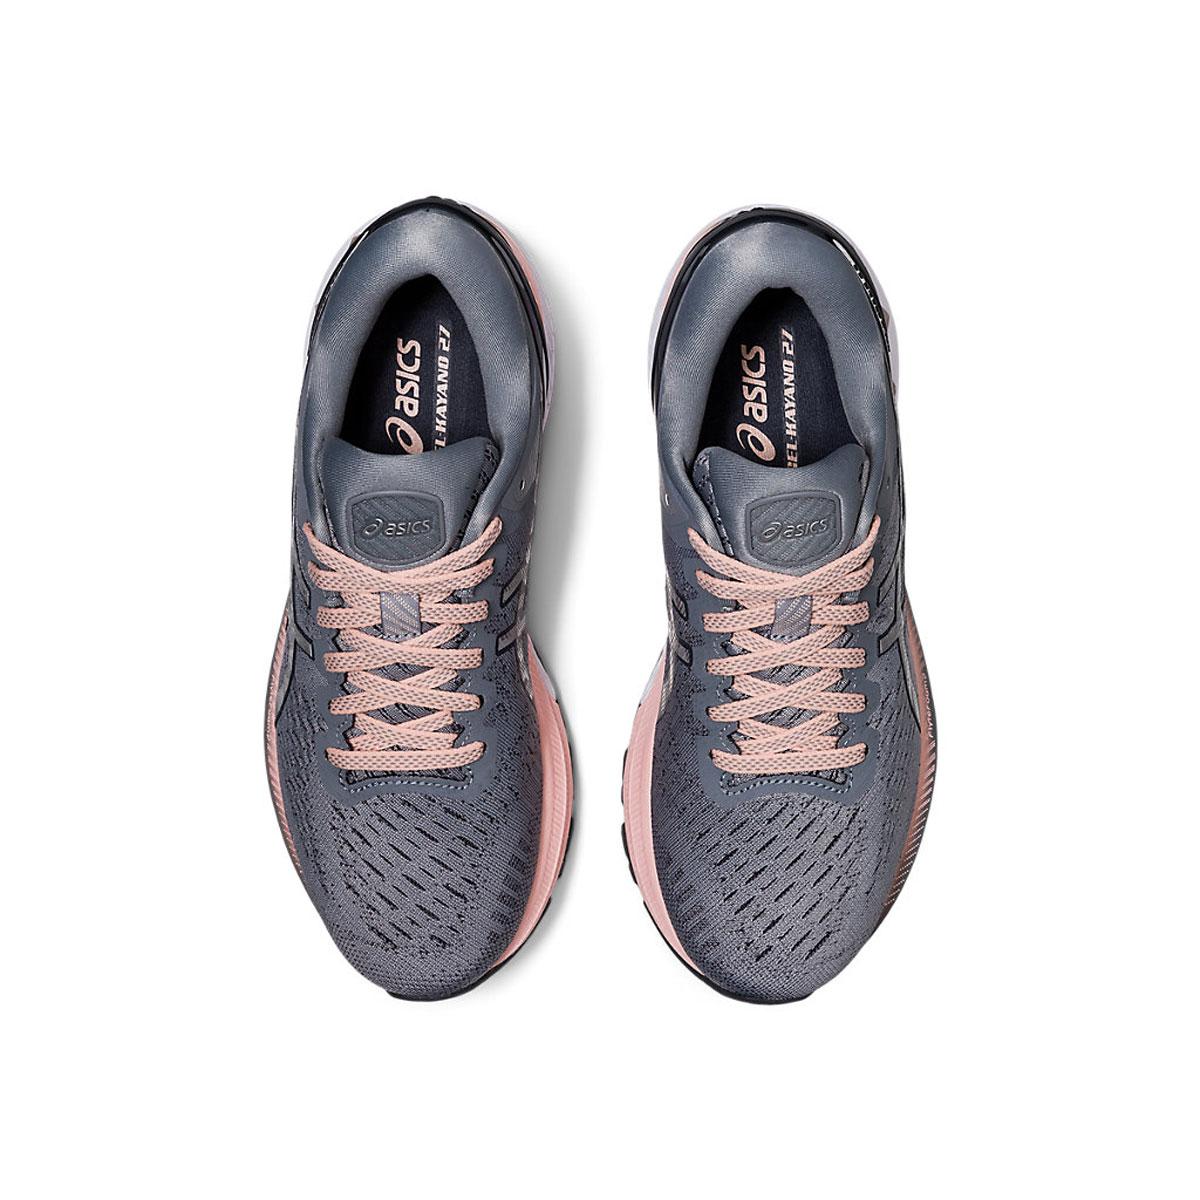 Women's Asics GEL-Kayano 27 Running Shoe - Color: Sheet Rock/Pure (Regular Width) - Size: 5, Sheet Rock/Pure, large, image 6